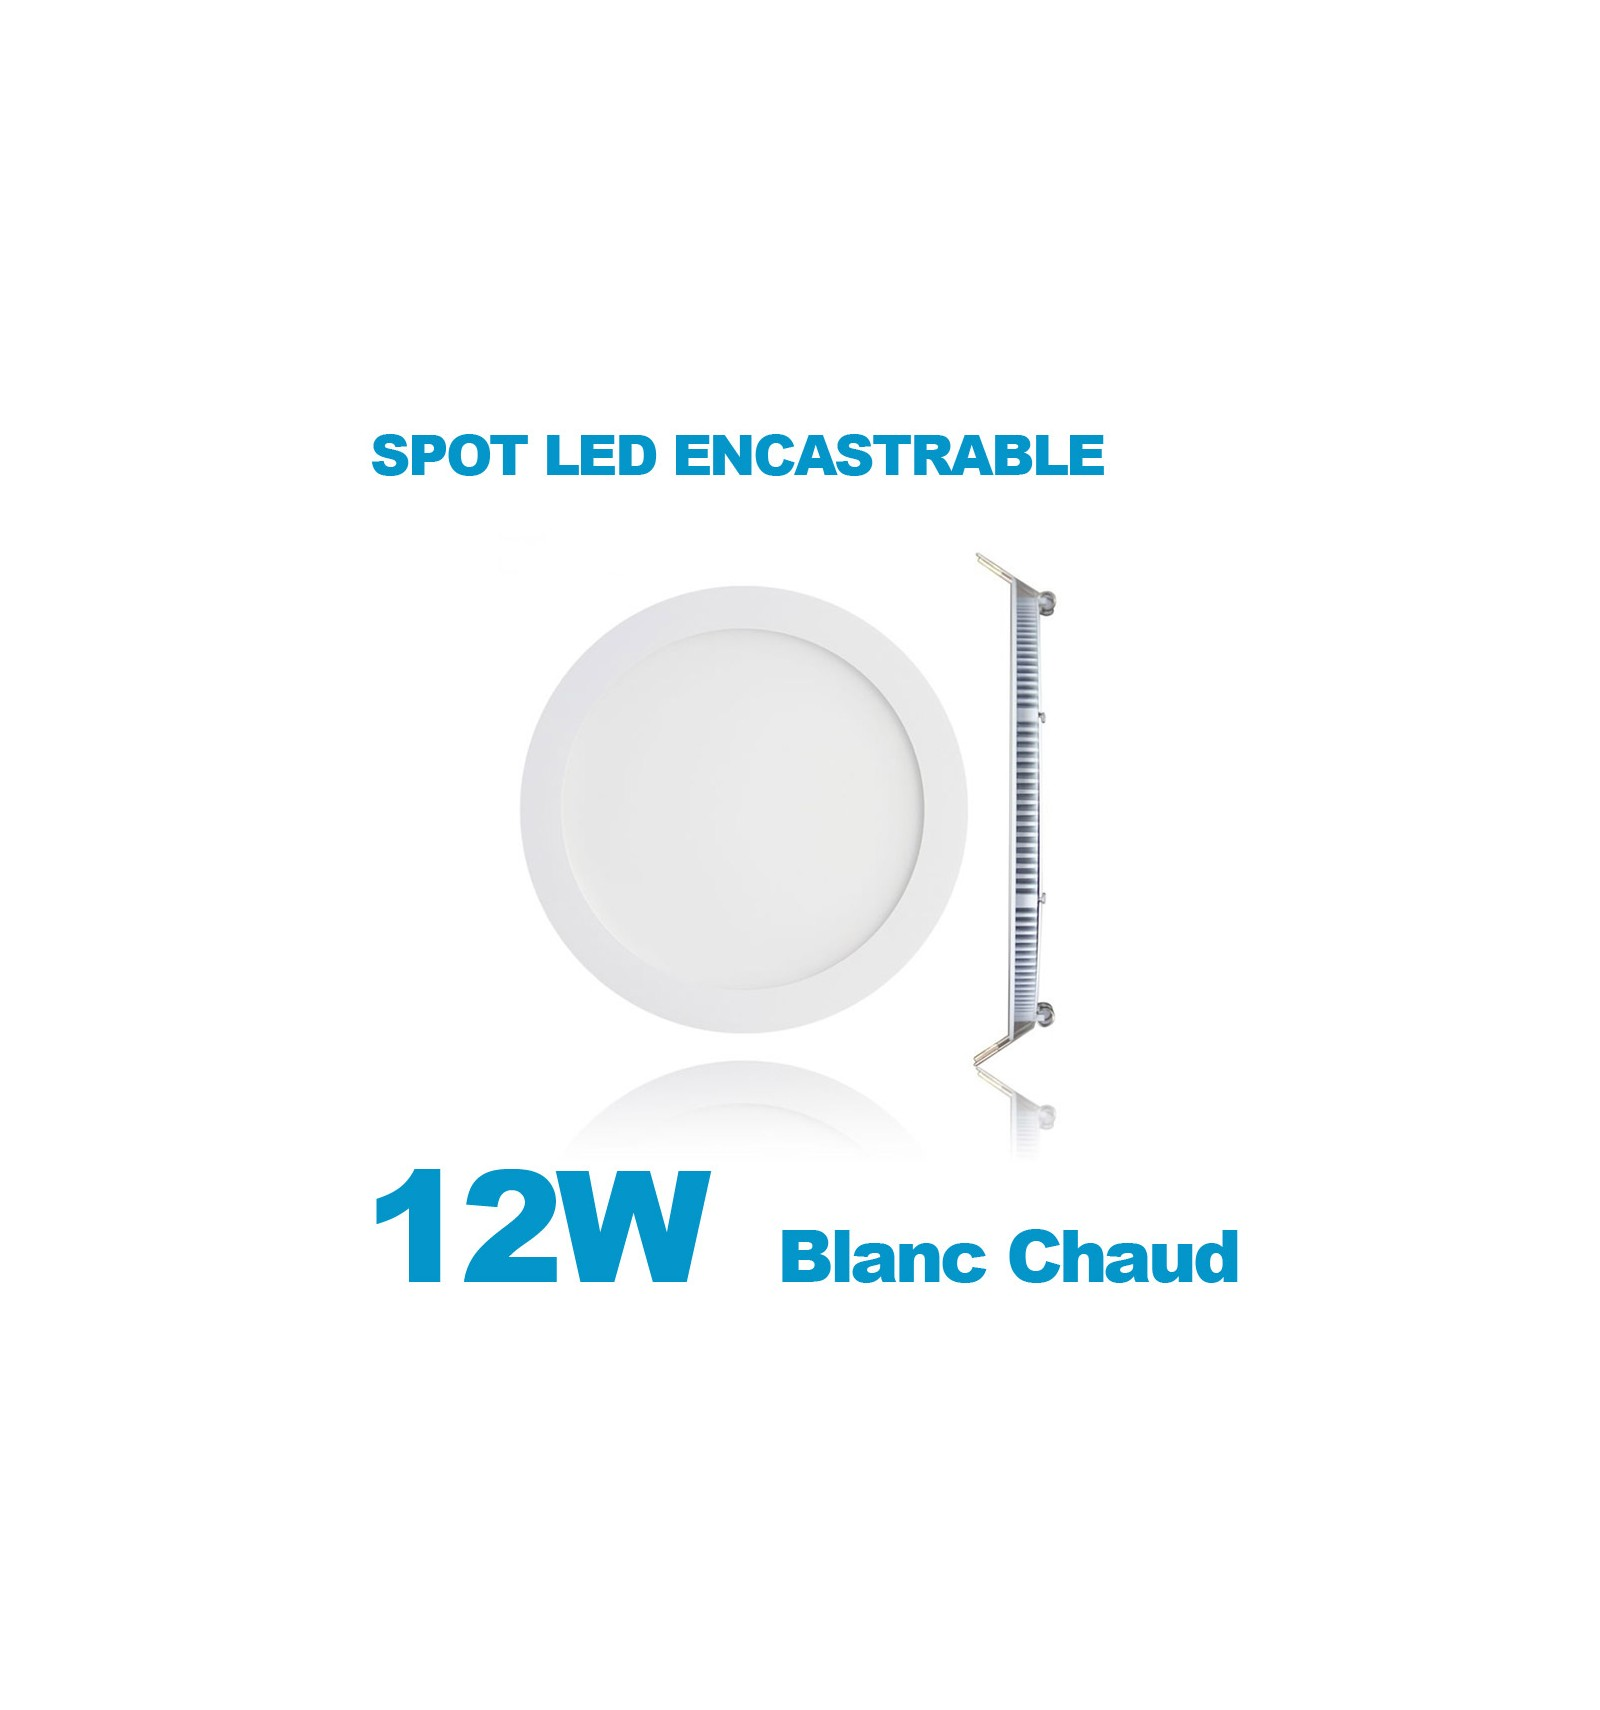 Spot led encastrable 12w extra plat rond - Spot led encastrable extra plat ...